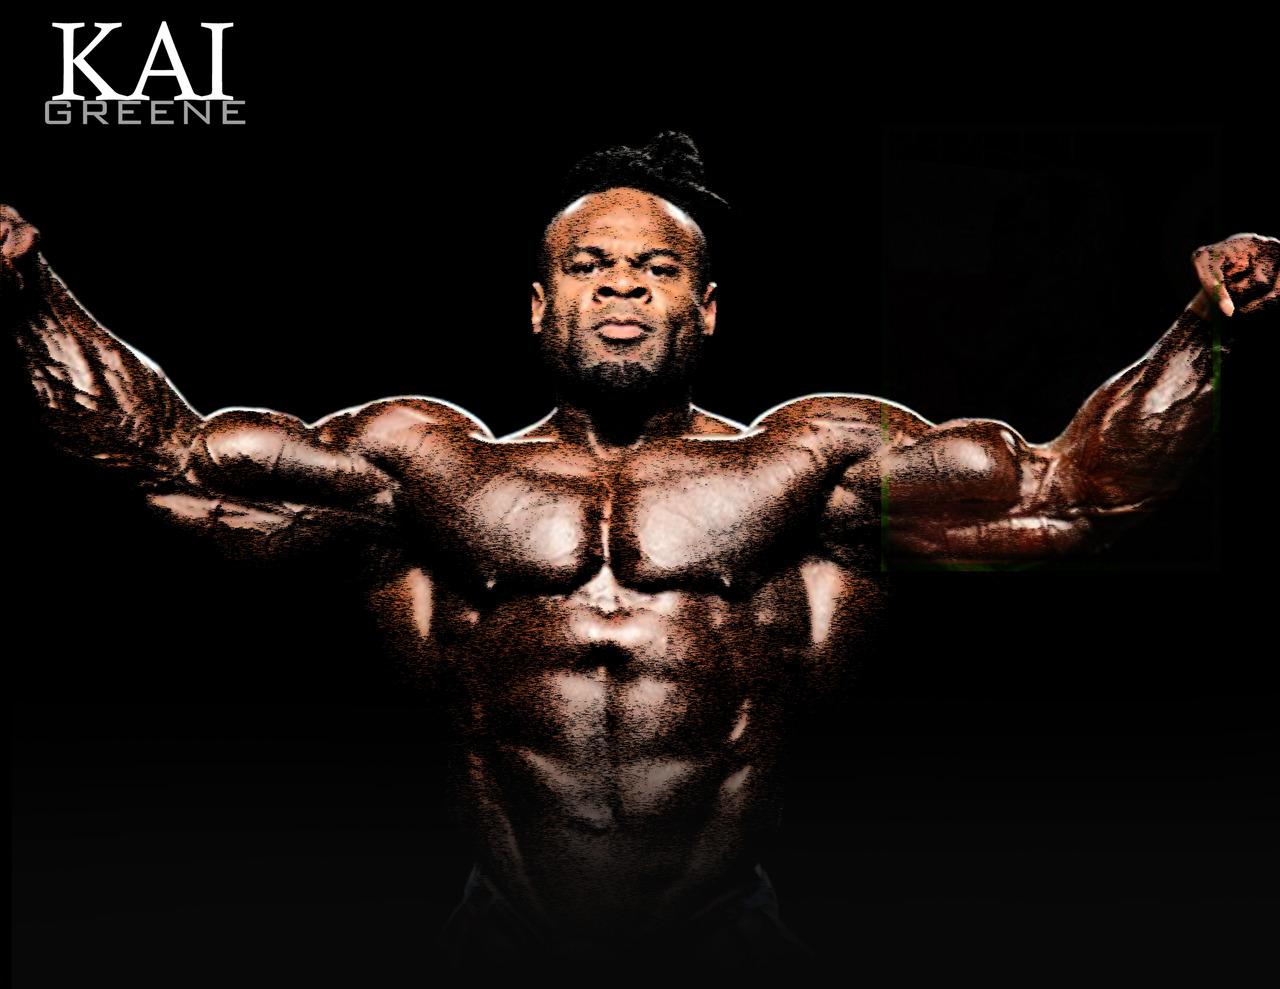 Daily Bodybuilding Motivation: Hot Body Male Model Kai Greene